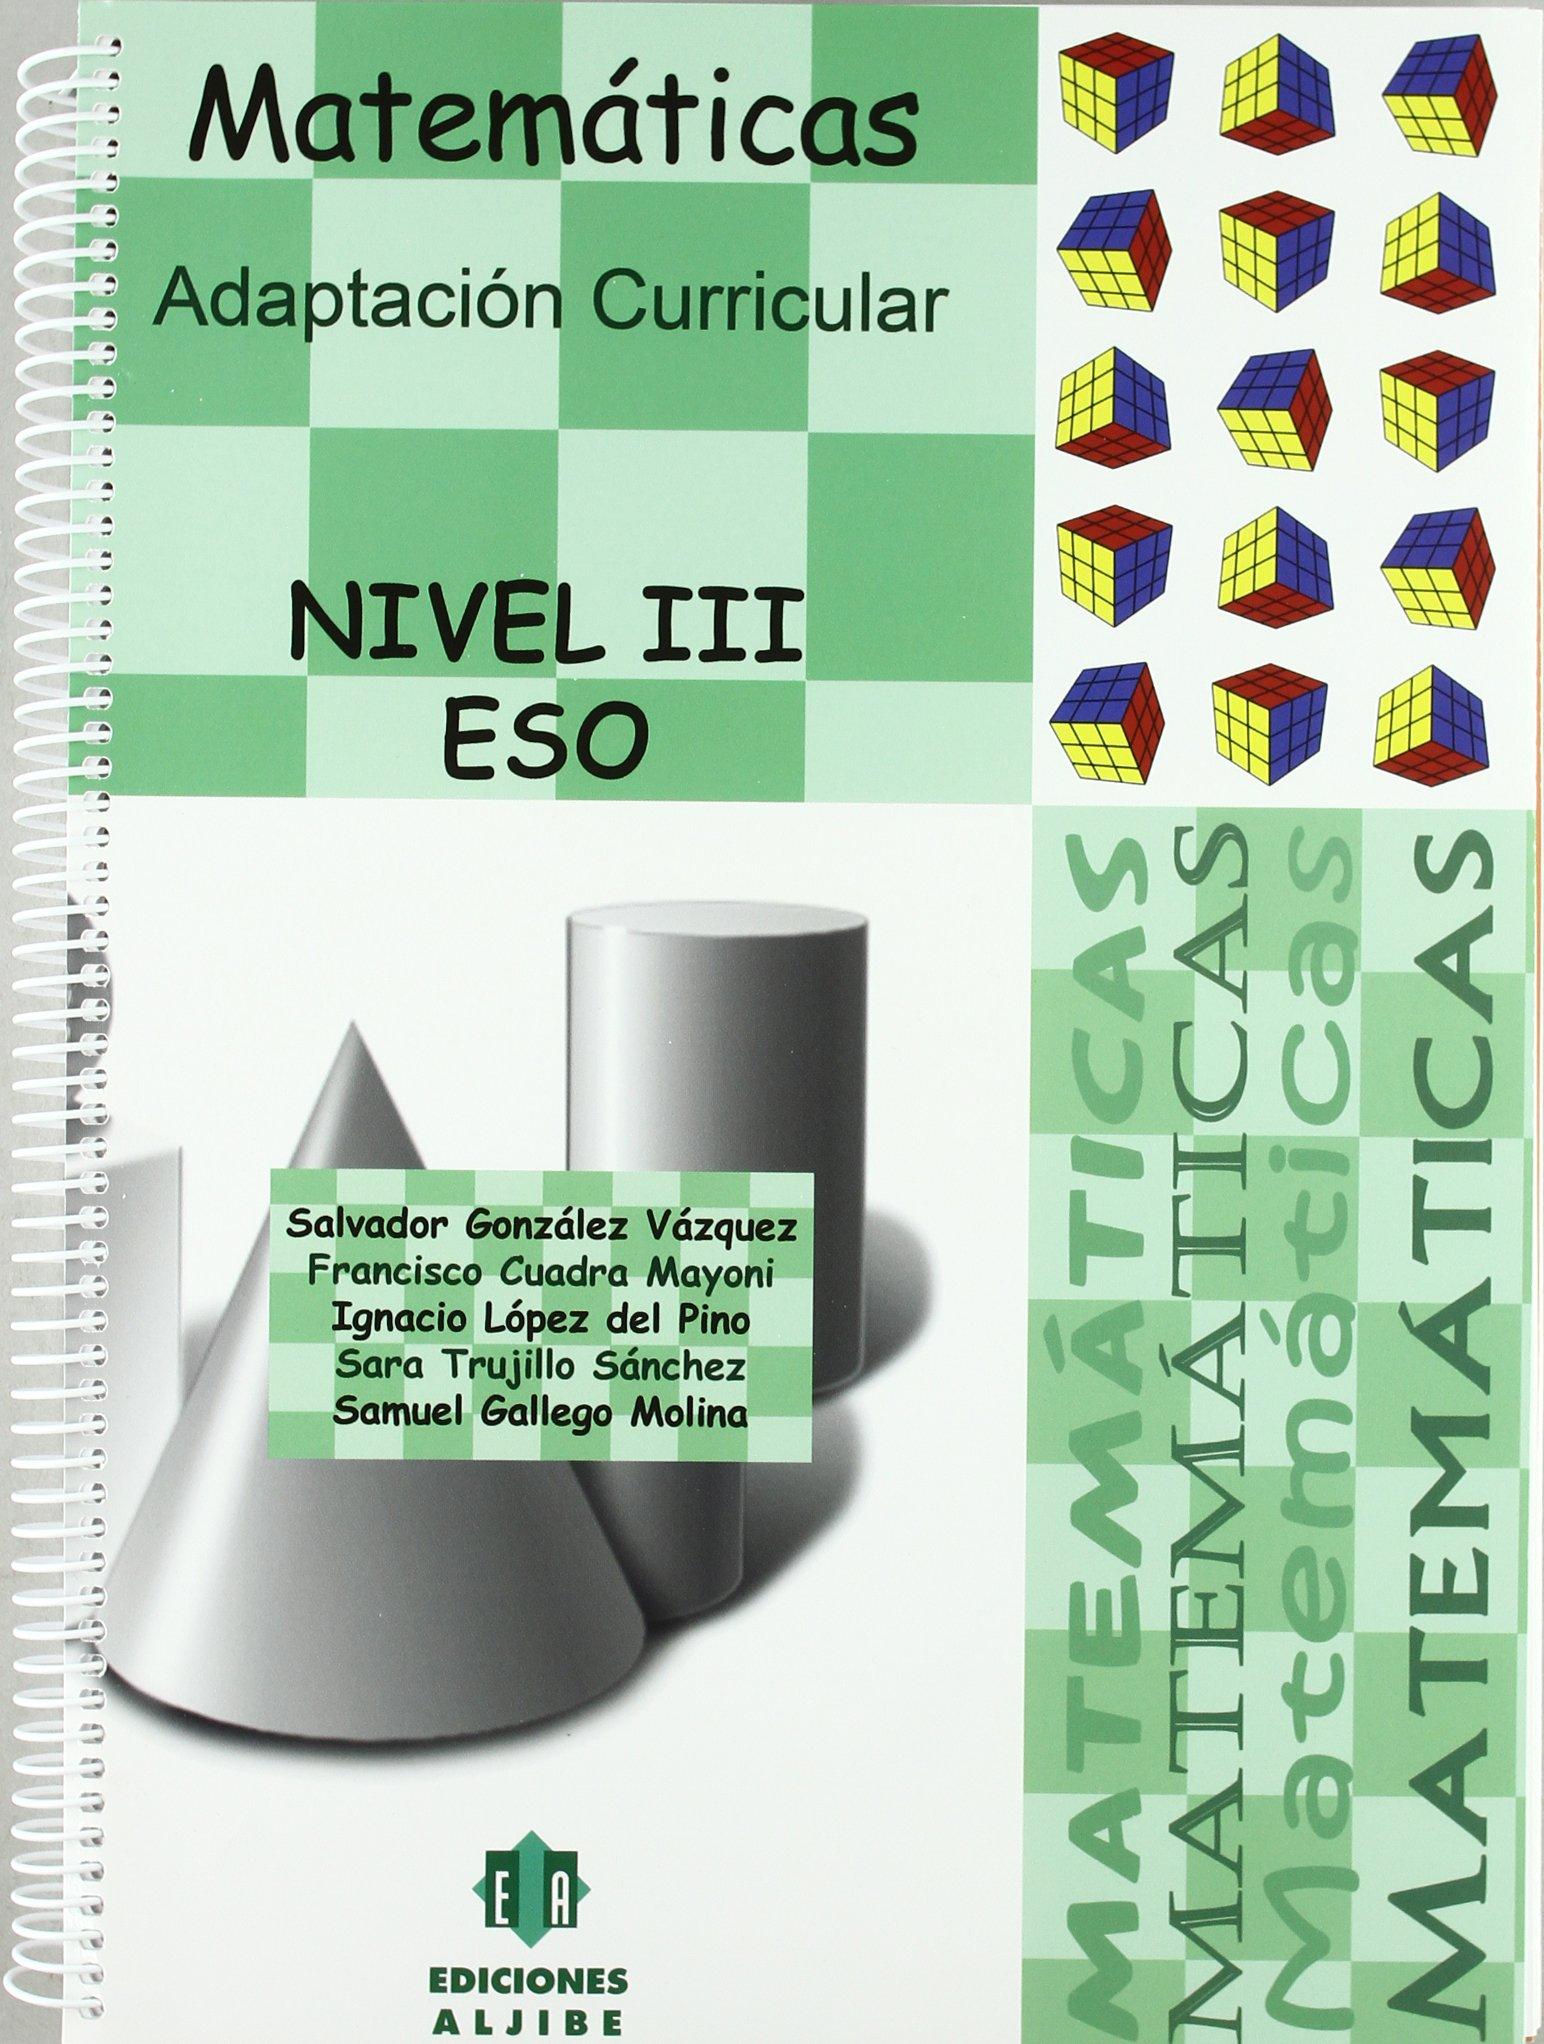 Matematicas. Nivel 3. Adaptacion Curricu: Adaptación curricular (ADAPTACIONES CURRICULARES PARA ESO)